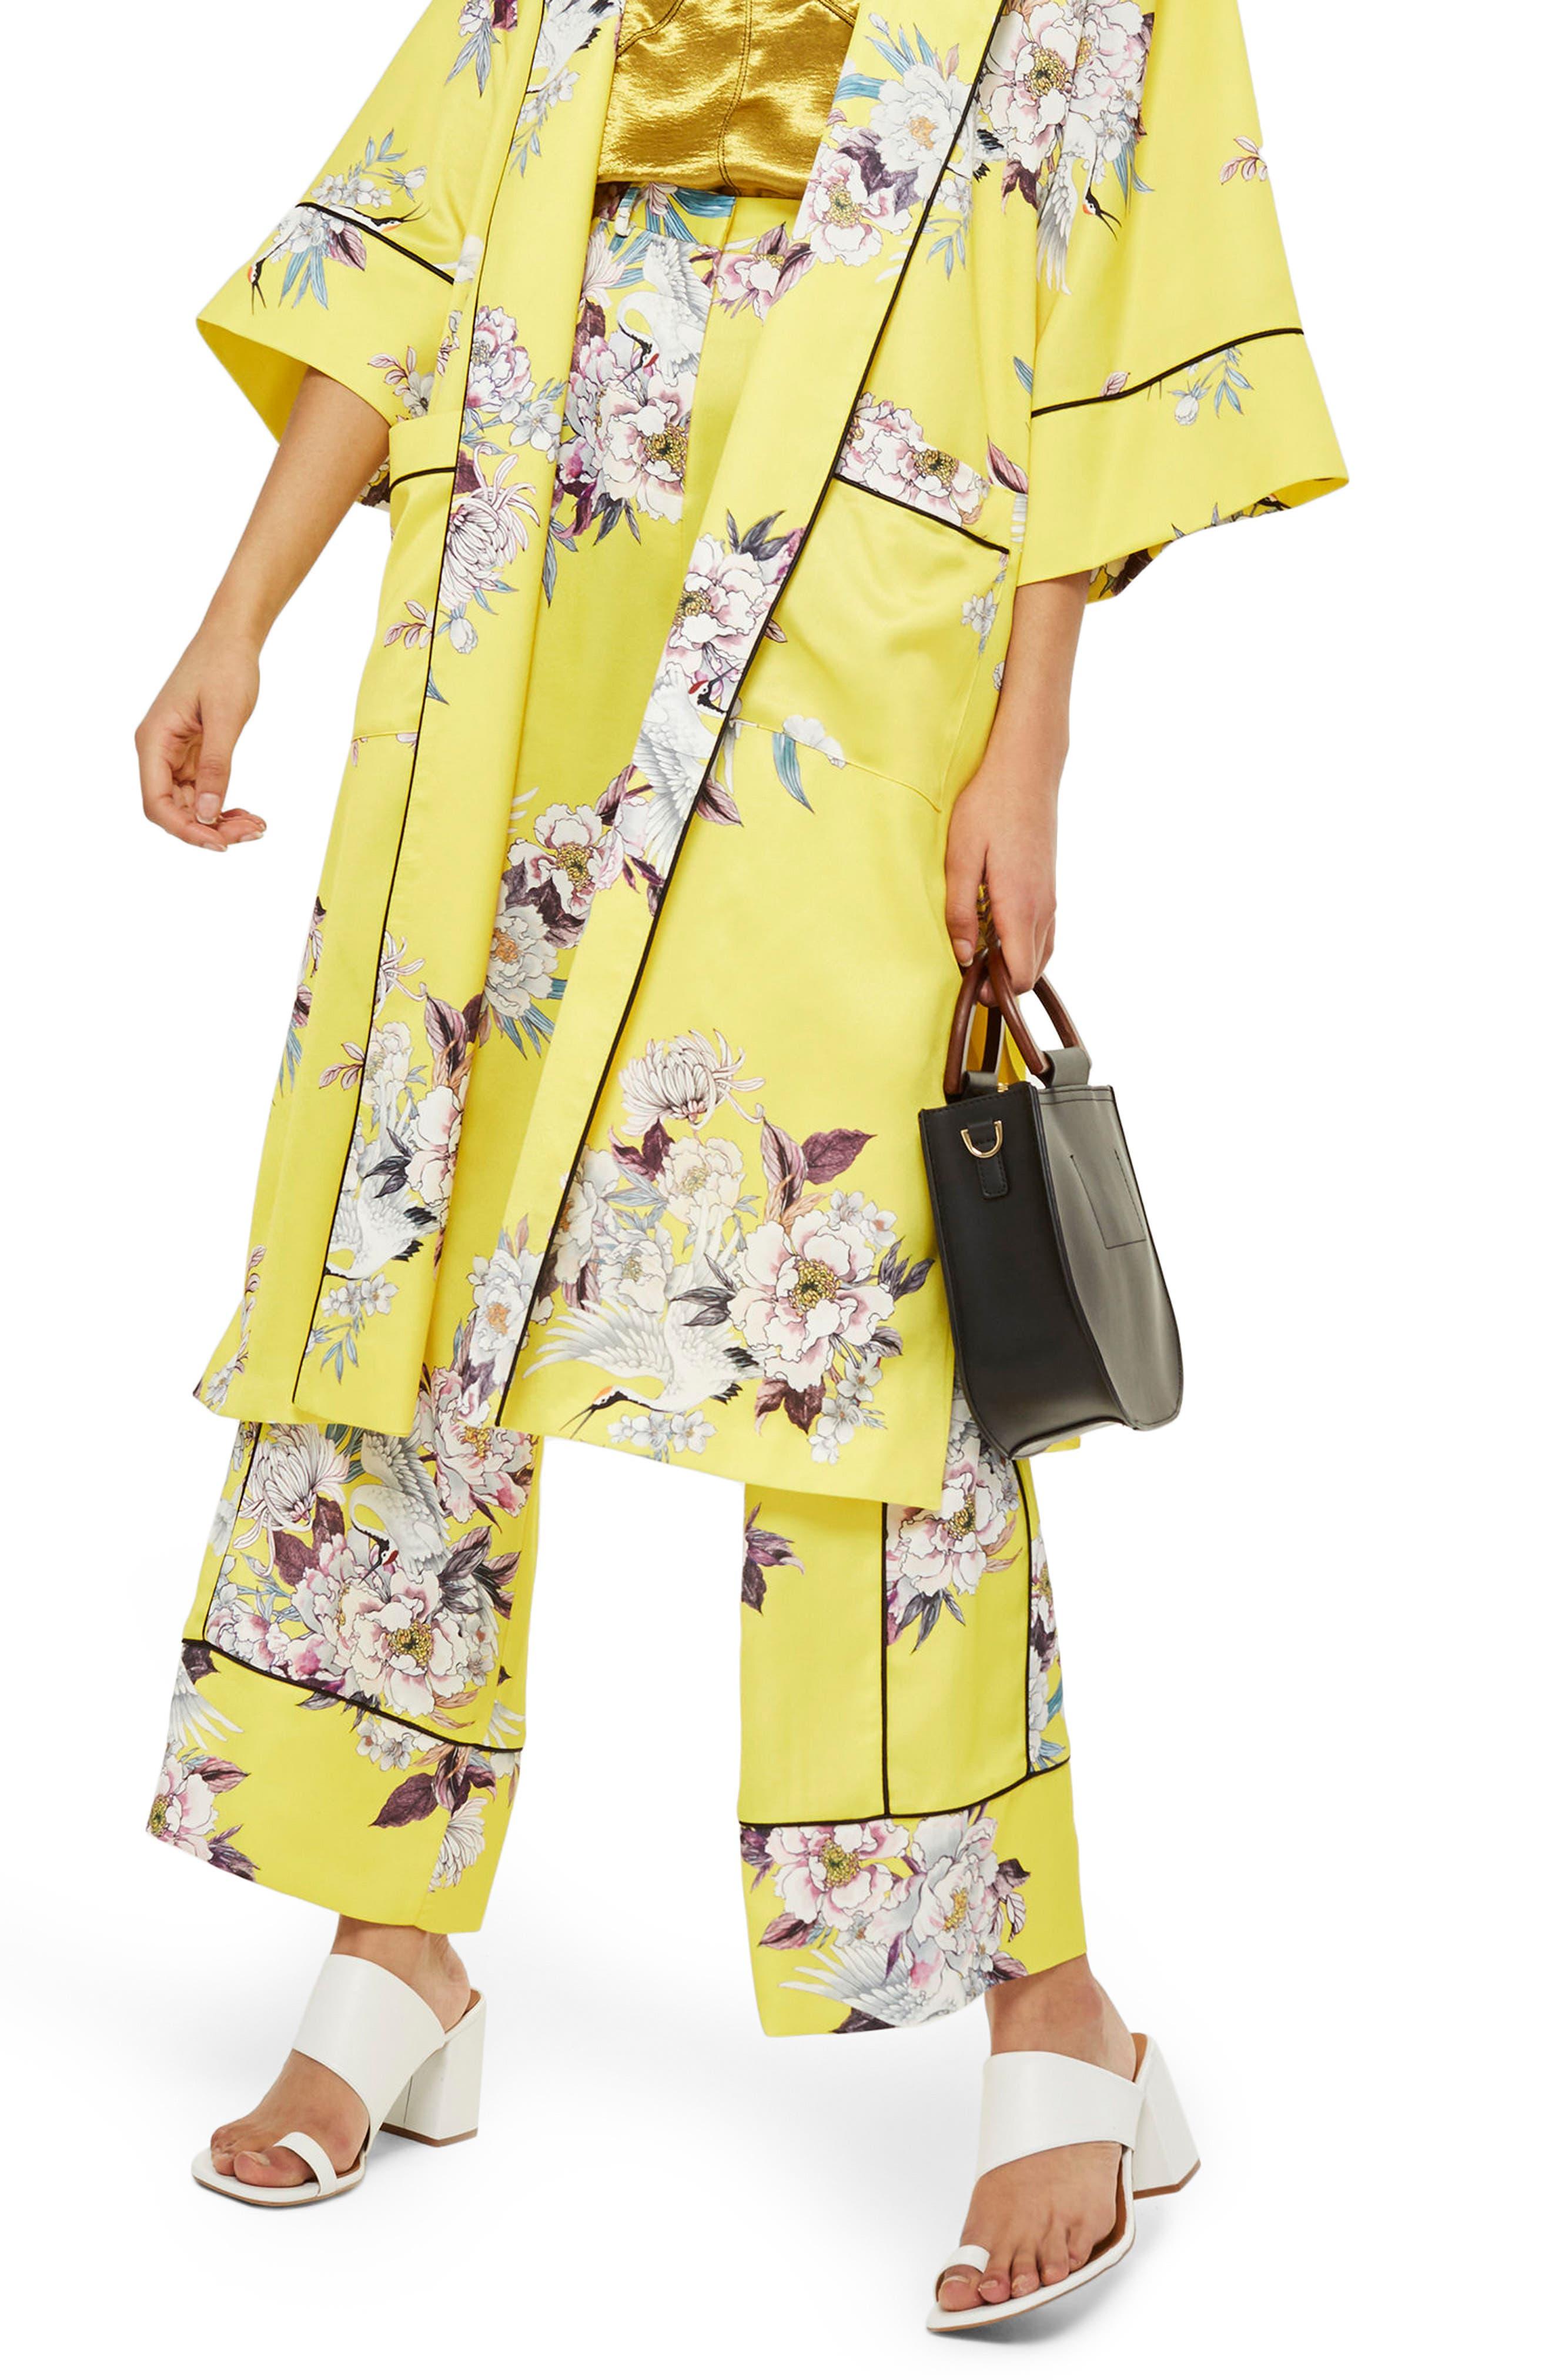 Heron Pajama Wide Leg Trousers,                             Main thumbnail 1, color,                             Yellow Multi